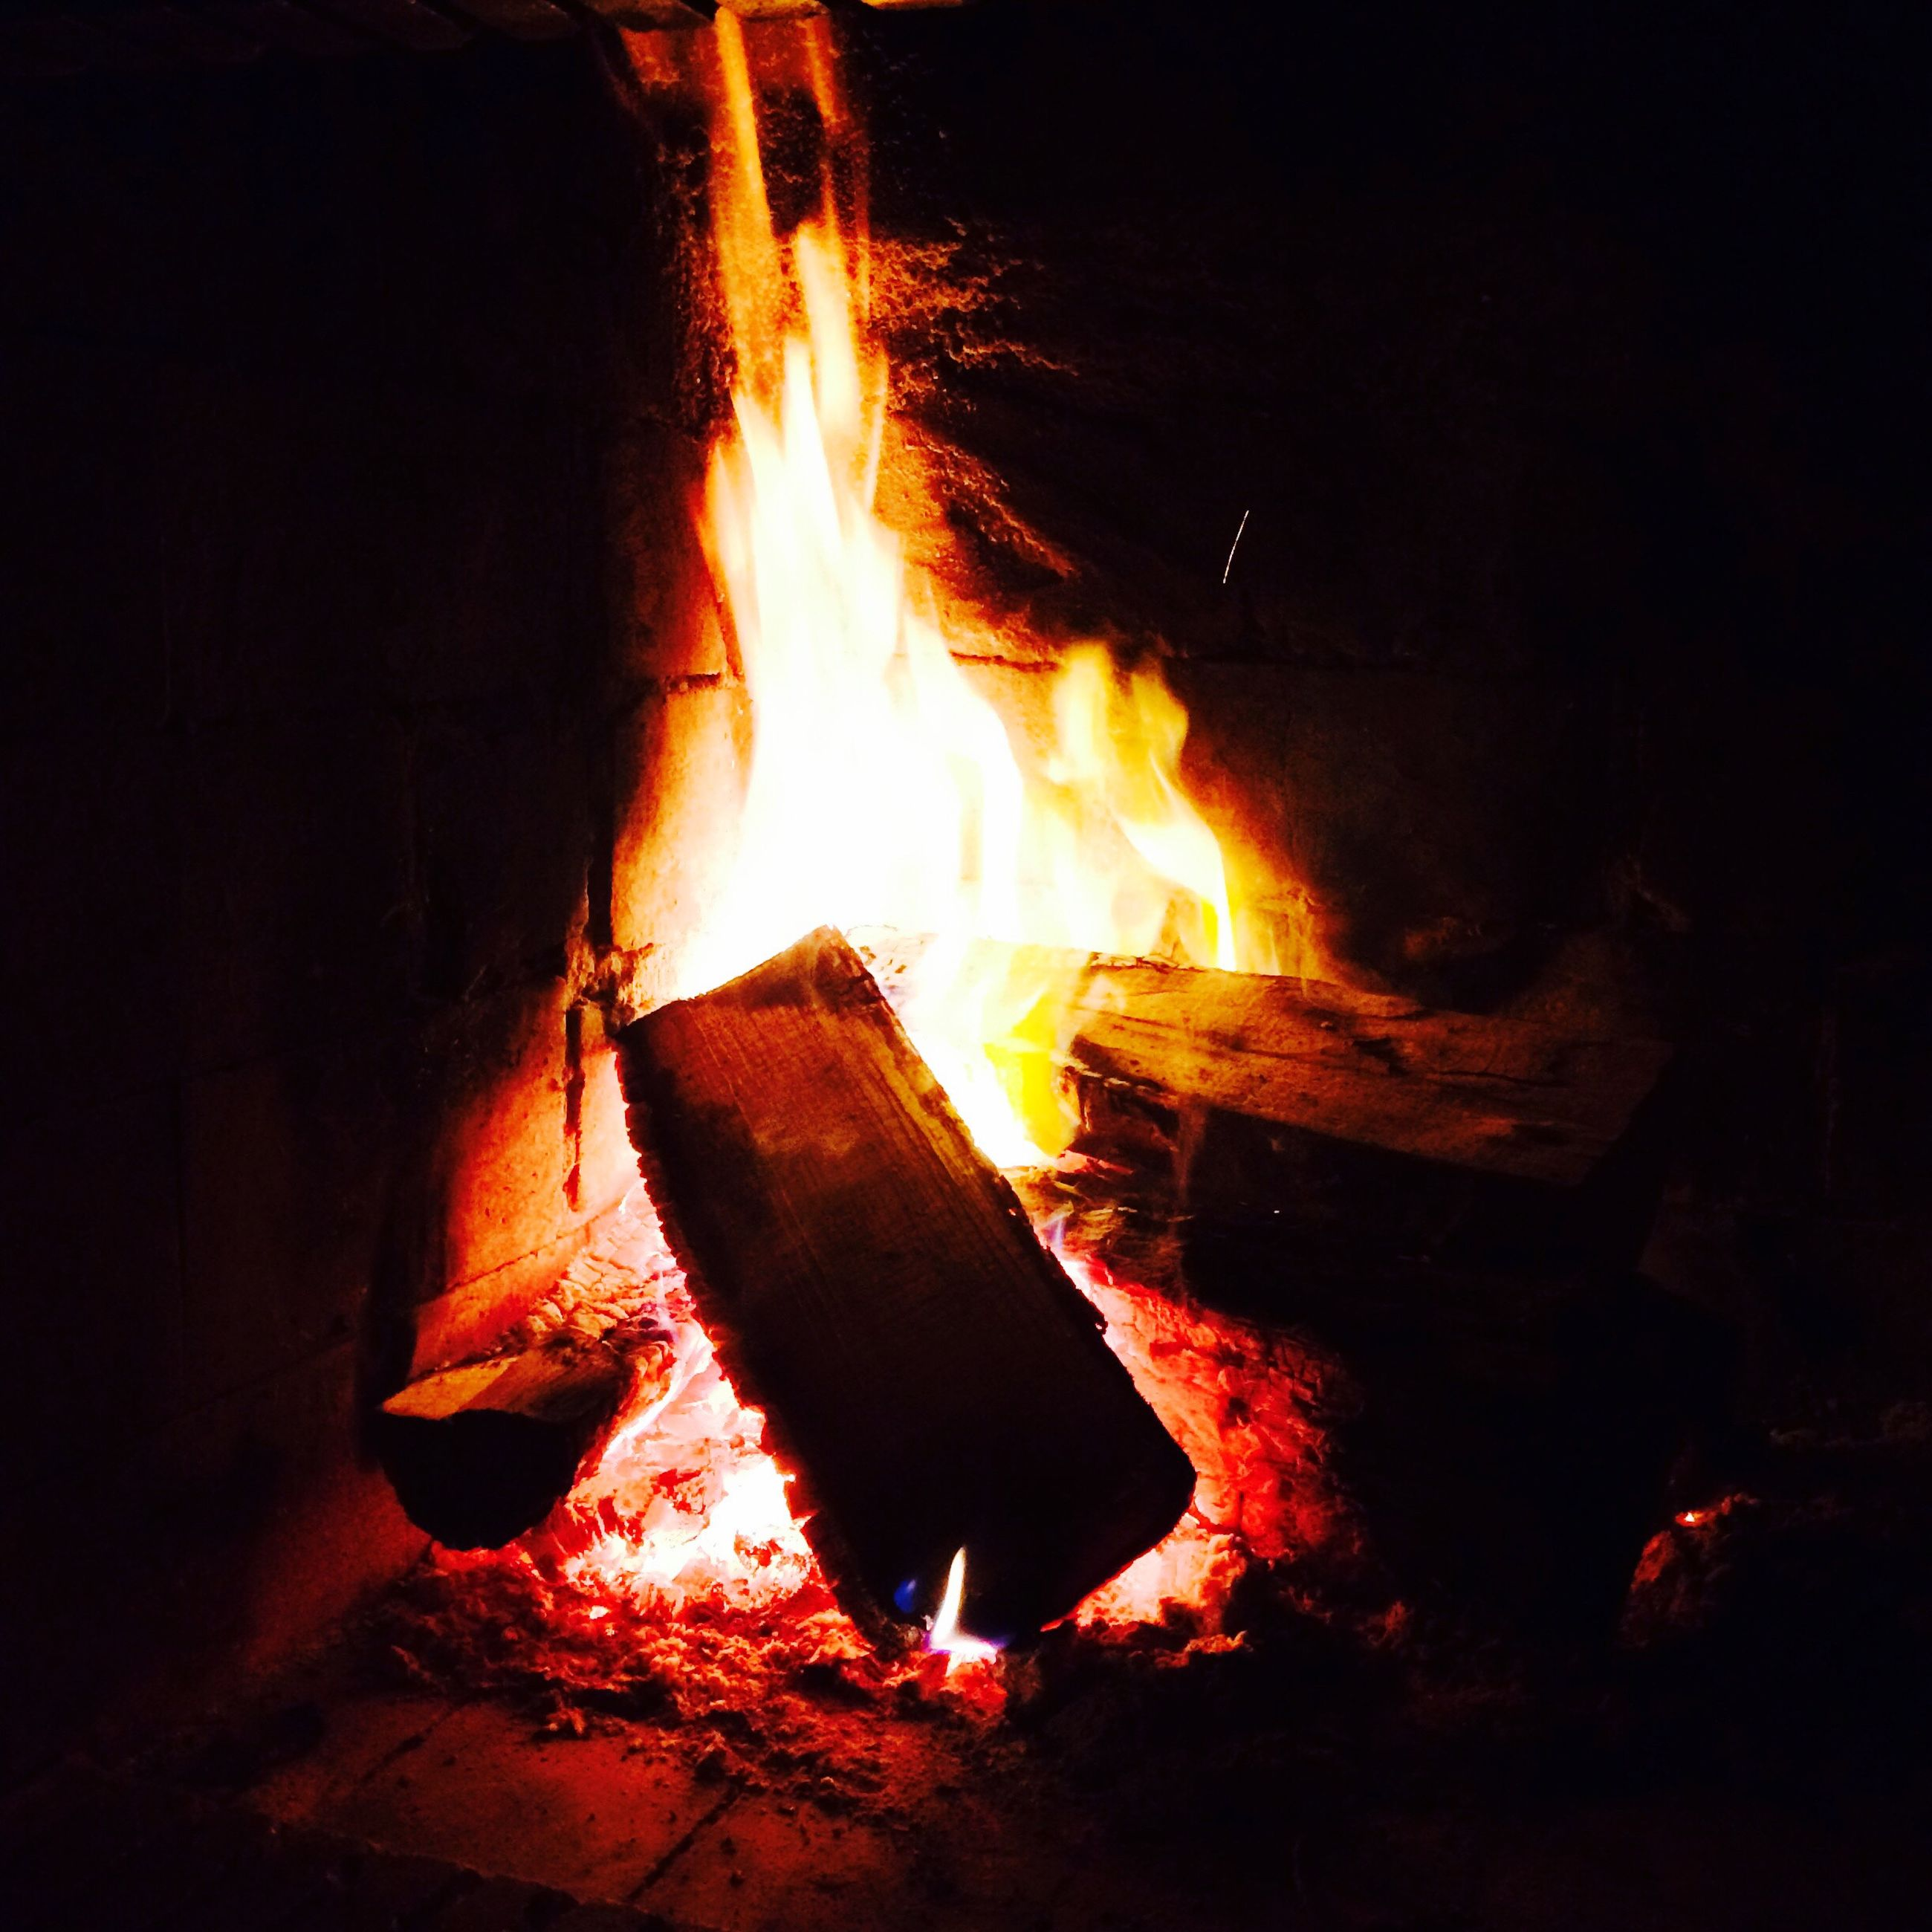 burning, flame, fire - natural phenomenon, heat - temperature, night, glowing, bonfire, firewood, fire, heat, campfire, dark, orange color, close-up, illuminated, motion, wood - material, light - natural phenomenon, fireplace, lit